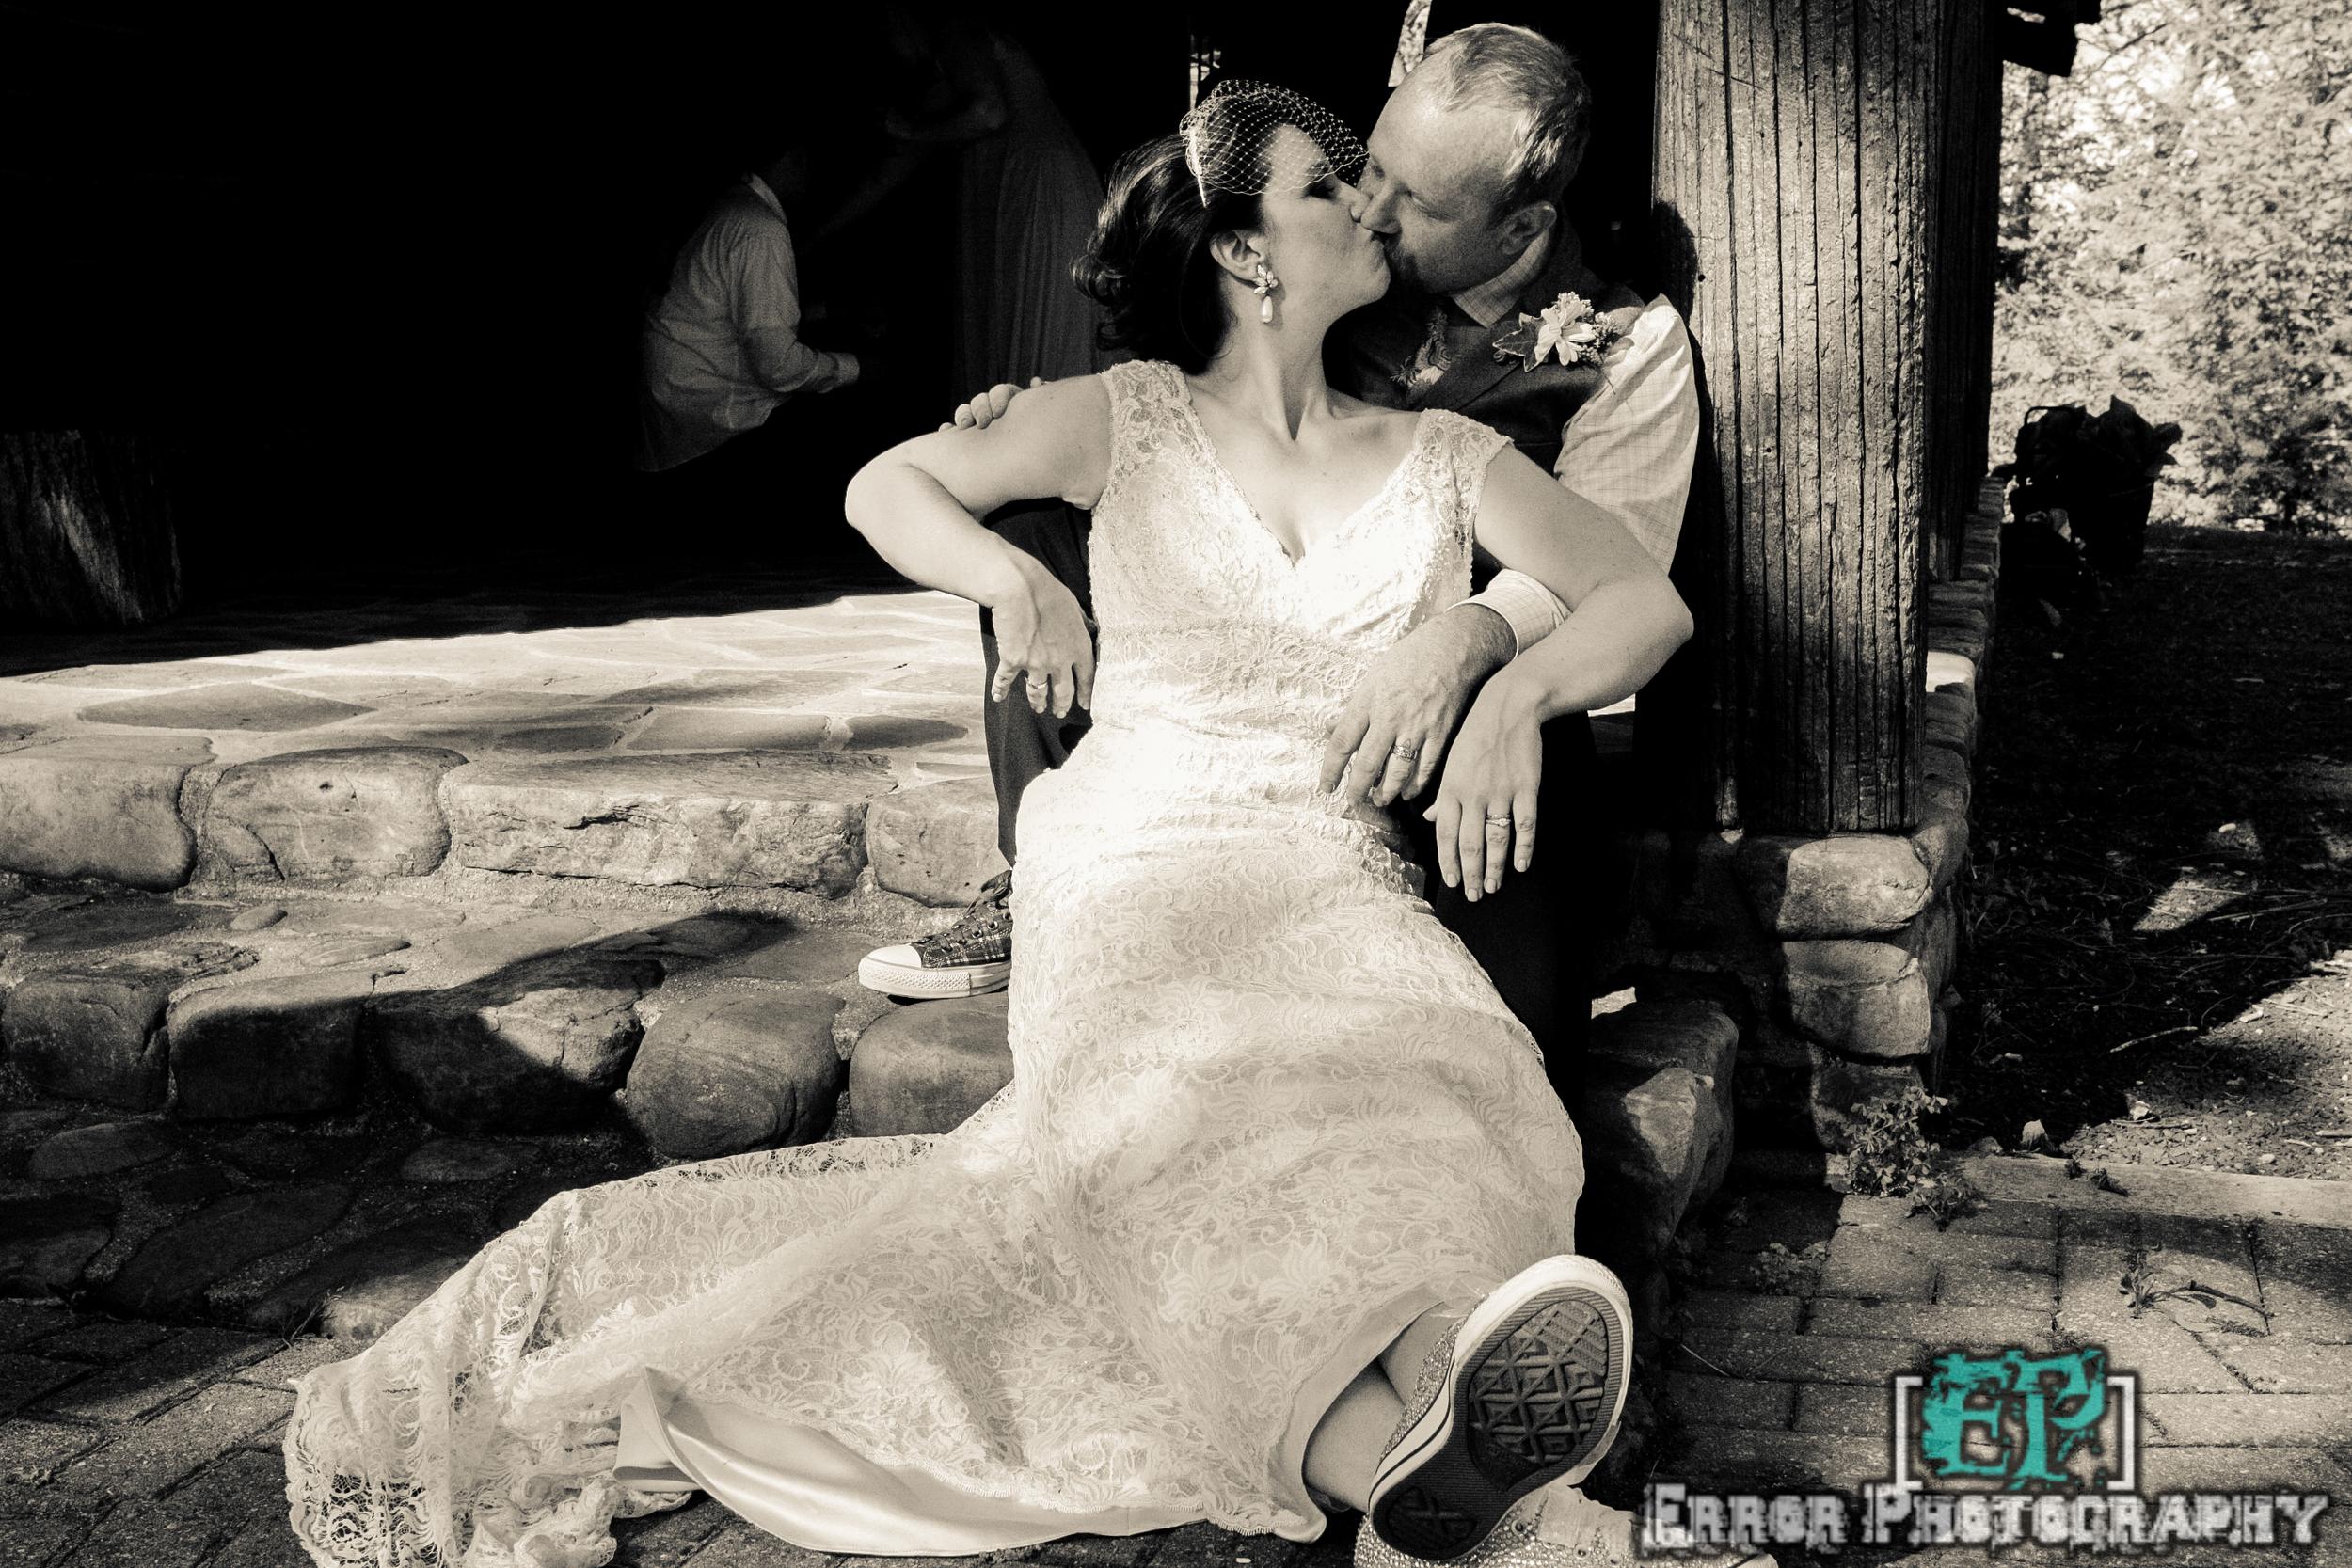 Wedding photos 5-4-13 Error Photography wm-43.jpg